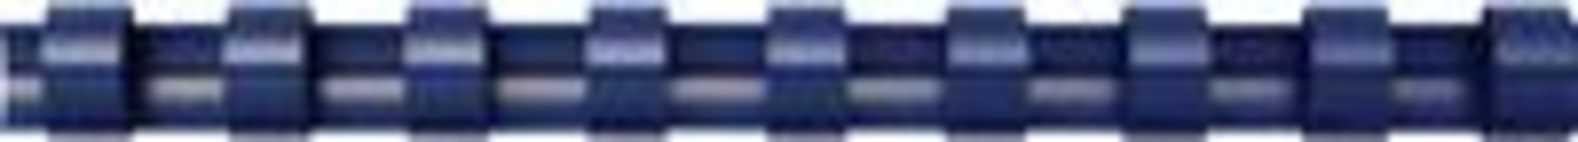 Fellowes bindruggen, pak van 100 stuks, 8 mm, blauw